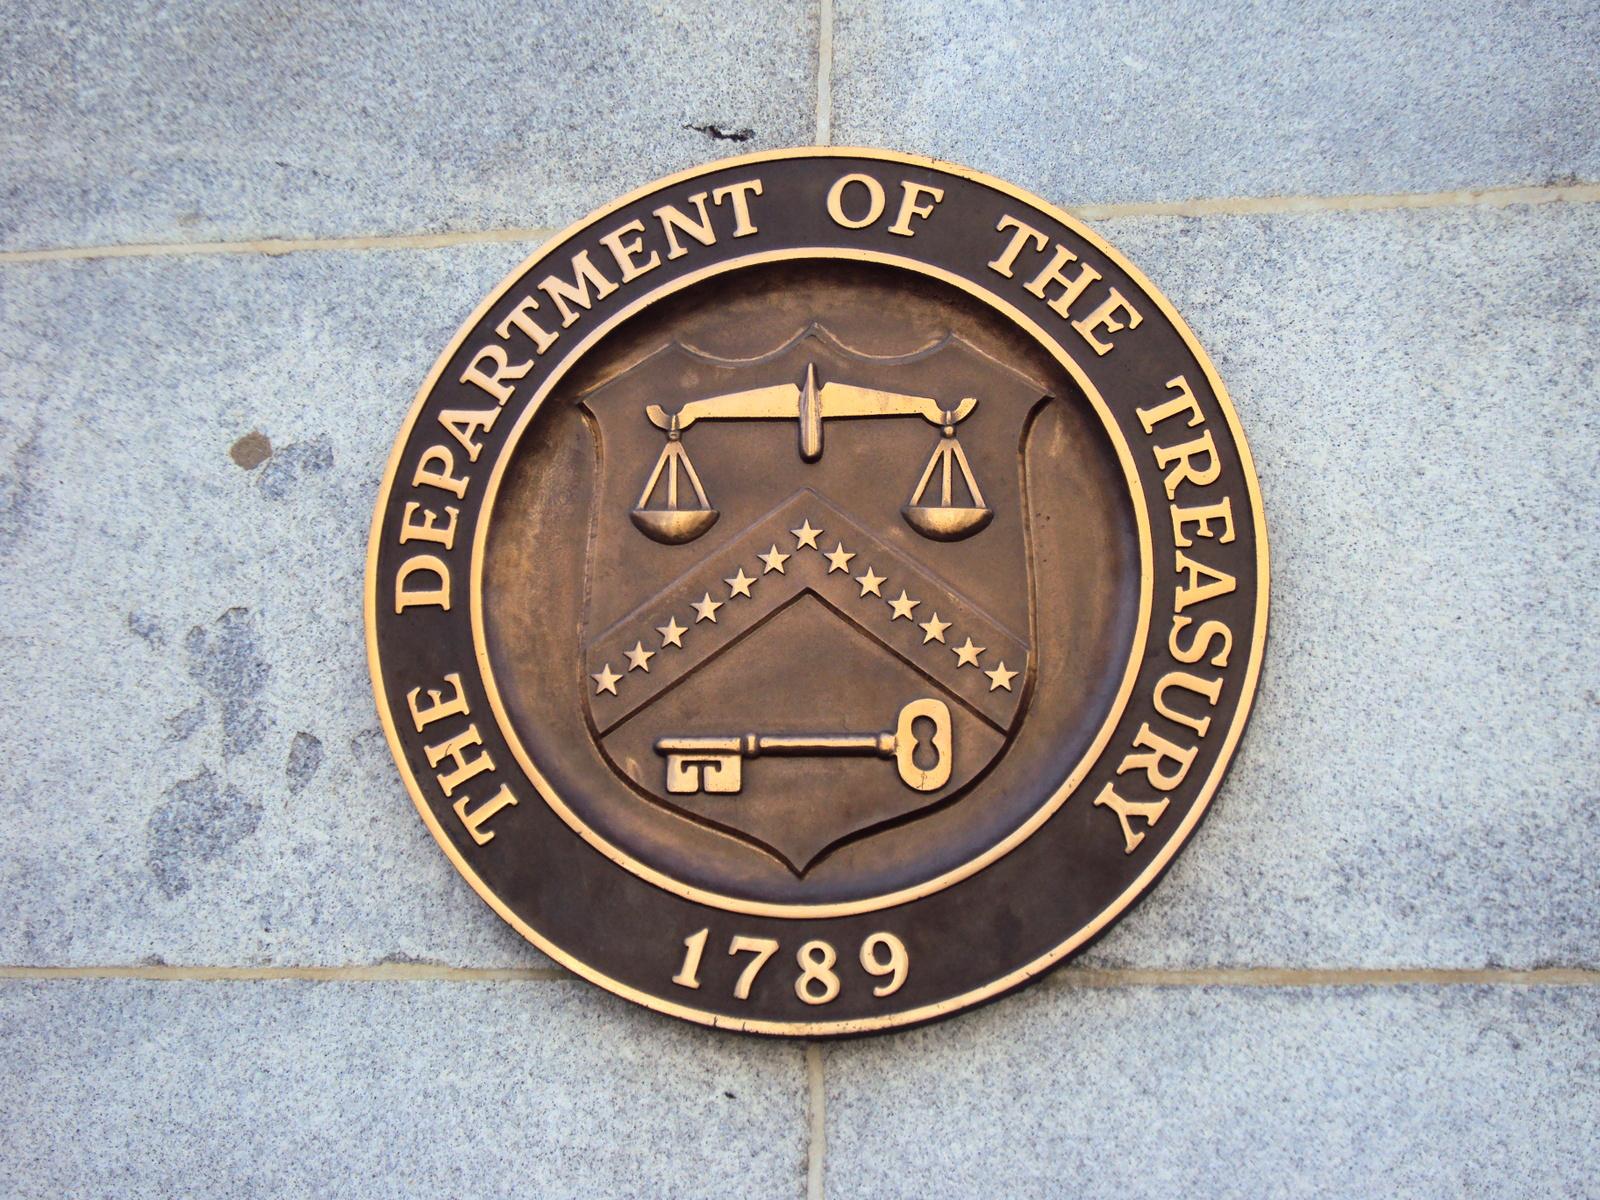 https://assets.sourcemedia.com/3f/ef/06190aa3417da03118c34297af90/treasury-dept-seal.jpg